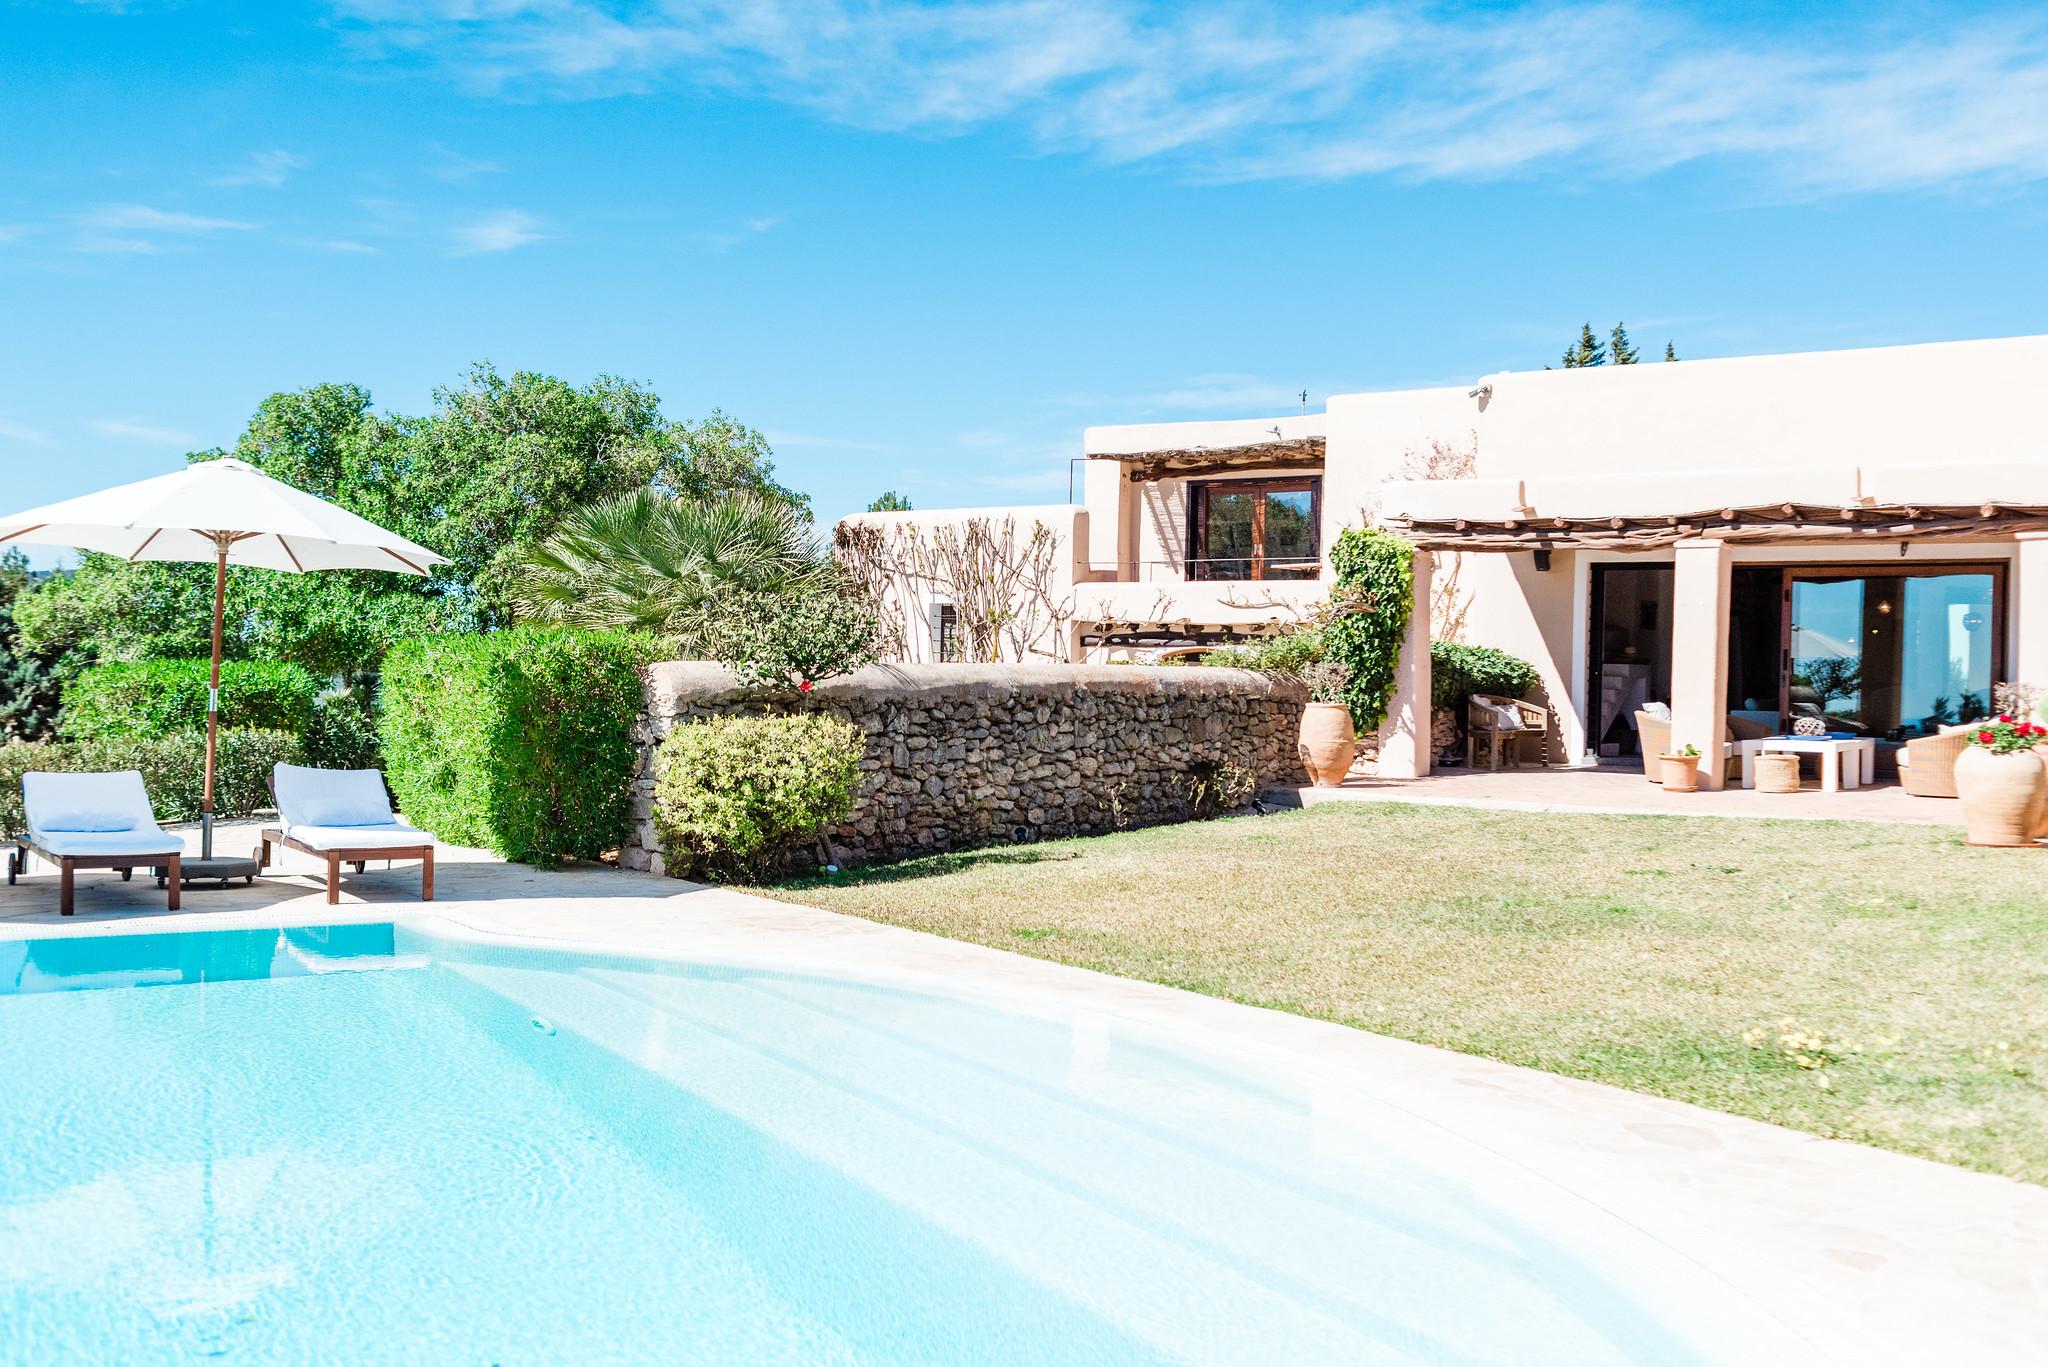 https://www.white-ibiza.com/wp-content/uploads/2020/06/white-ibiza-villas-villa-andrea-exterior.jpg